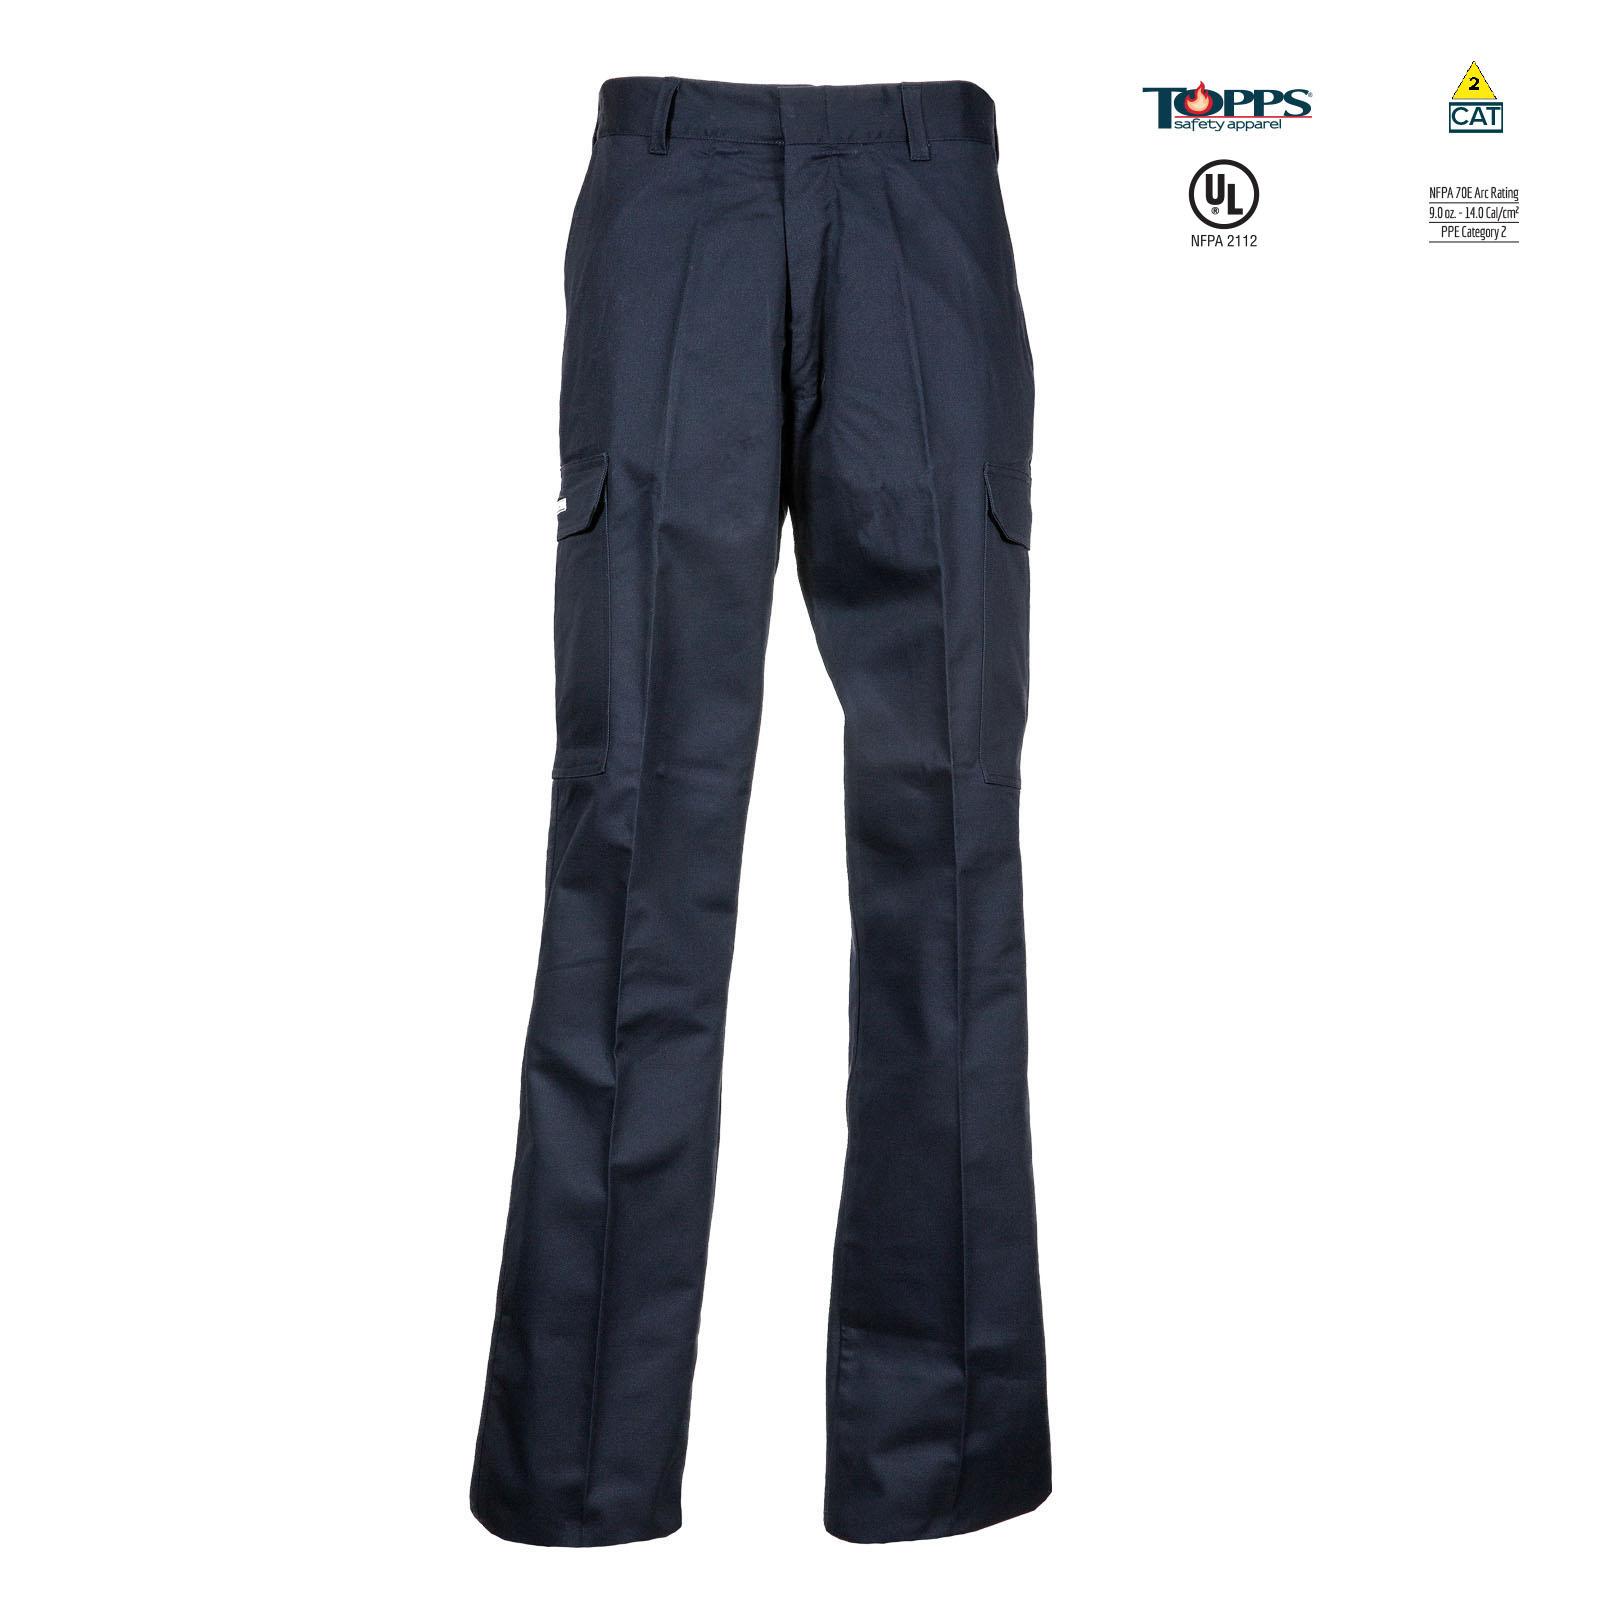 PEAK FR 88/12 Cotton/Nylon Blend Flame Resistant Cargo Pant-TOPPS